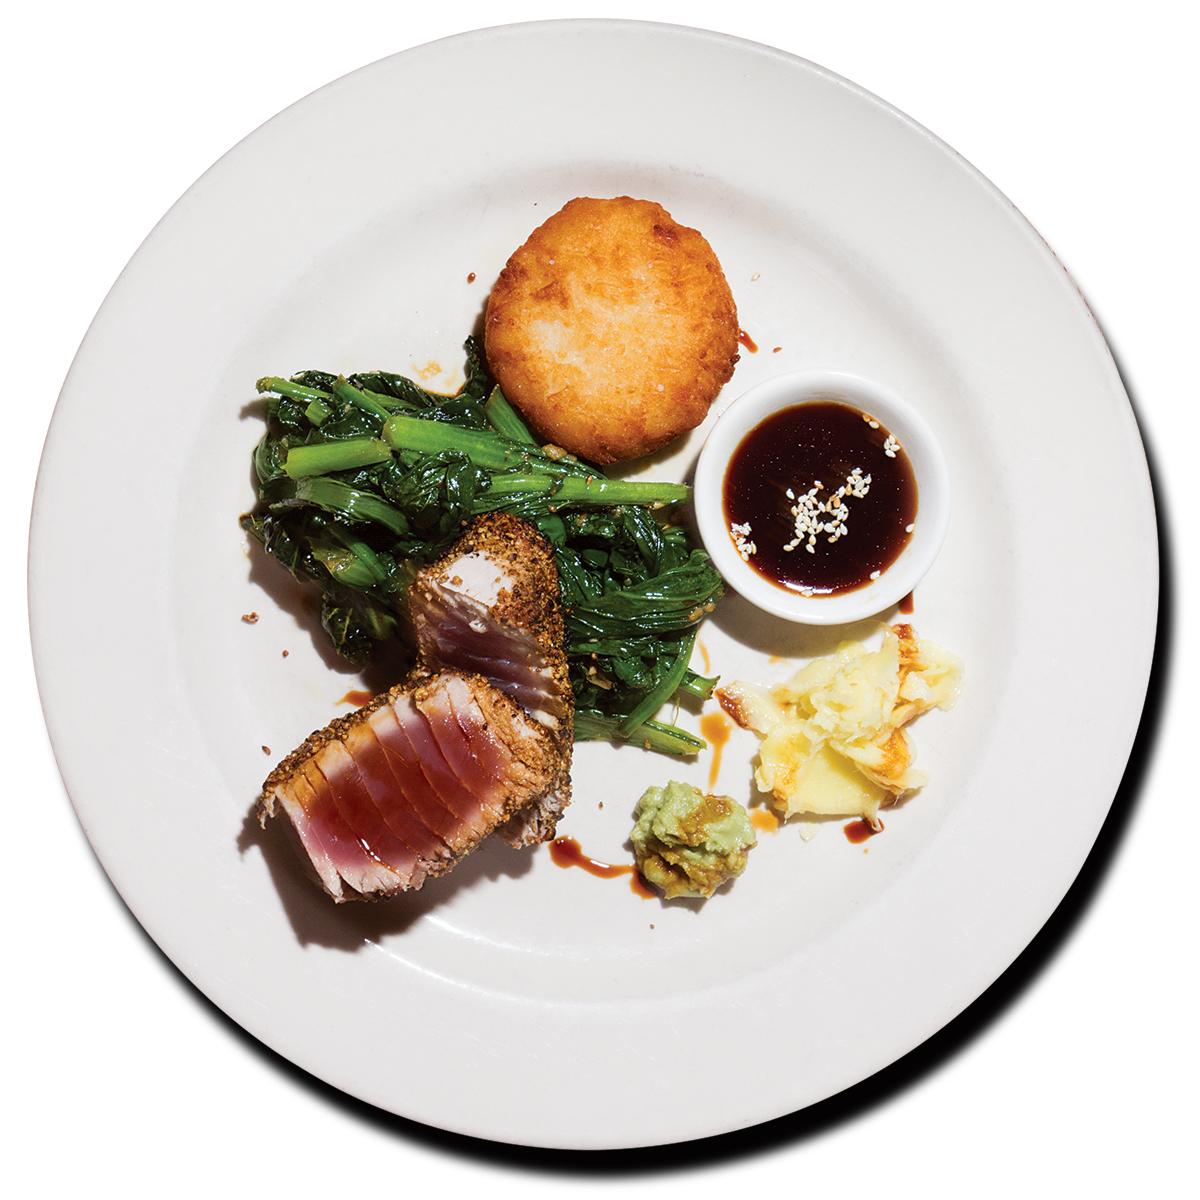 East Coast Grill, Best Neighborhood Restaurant, in Boston